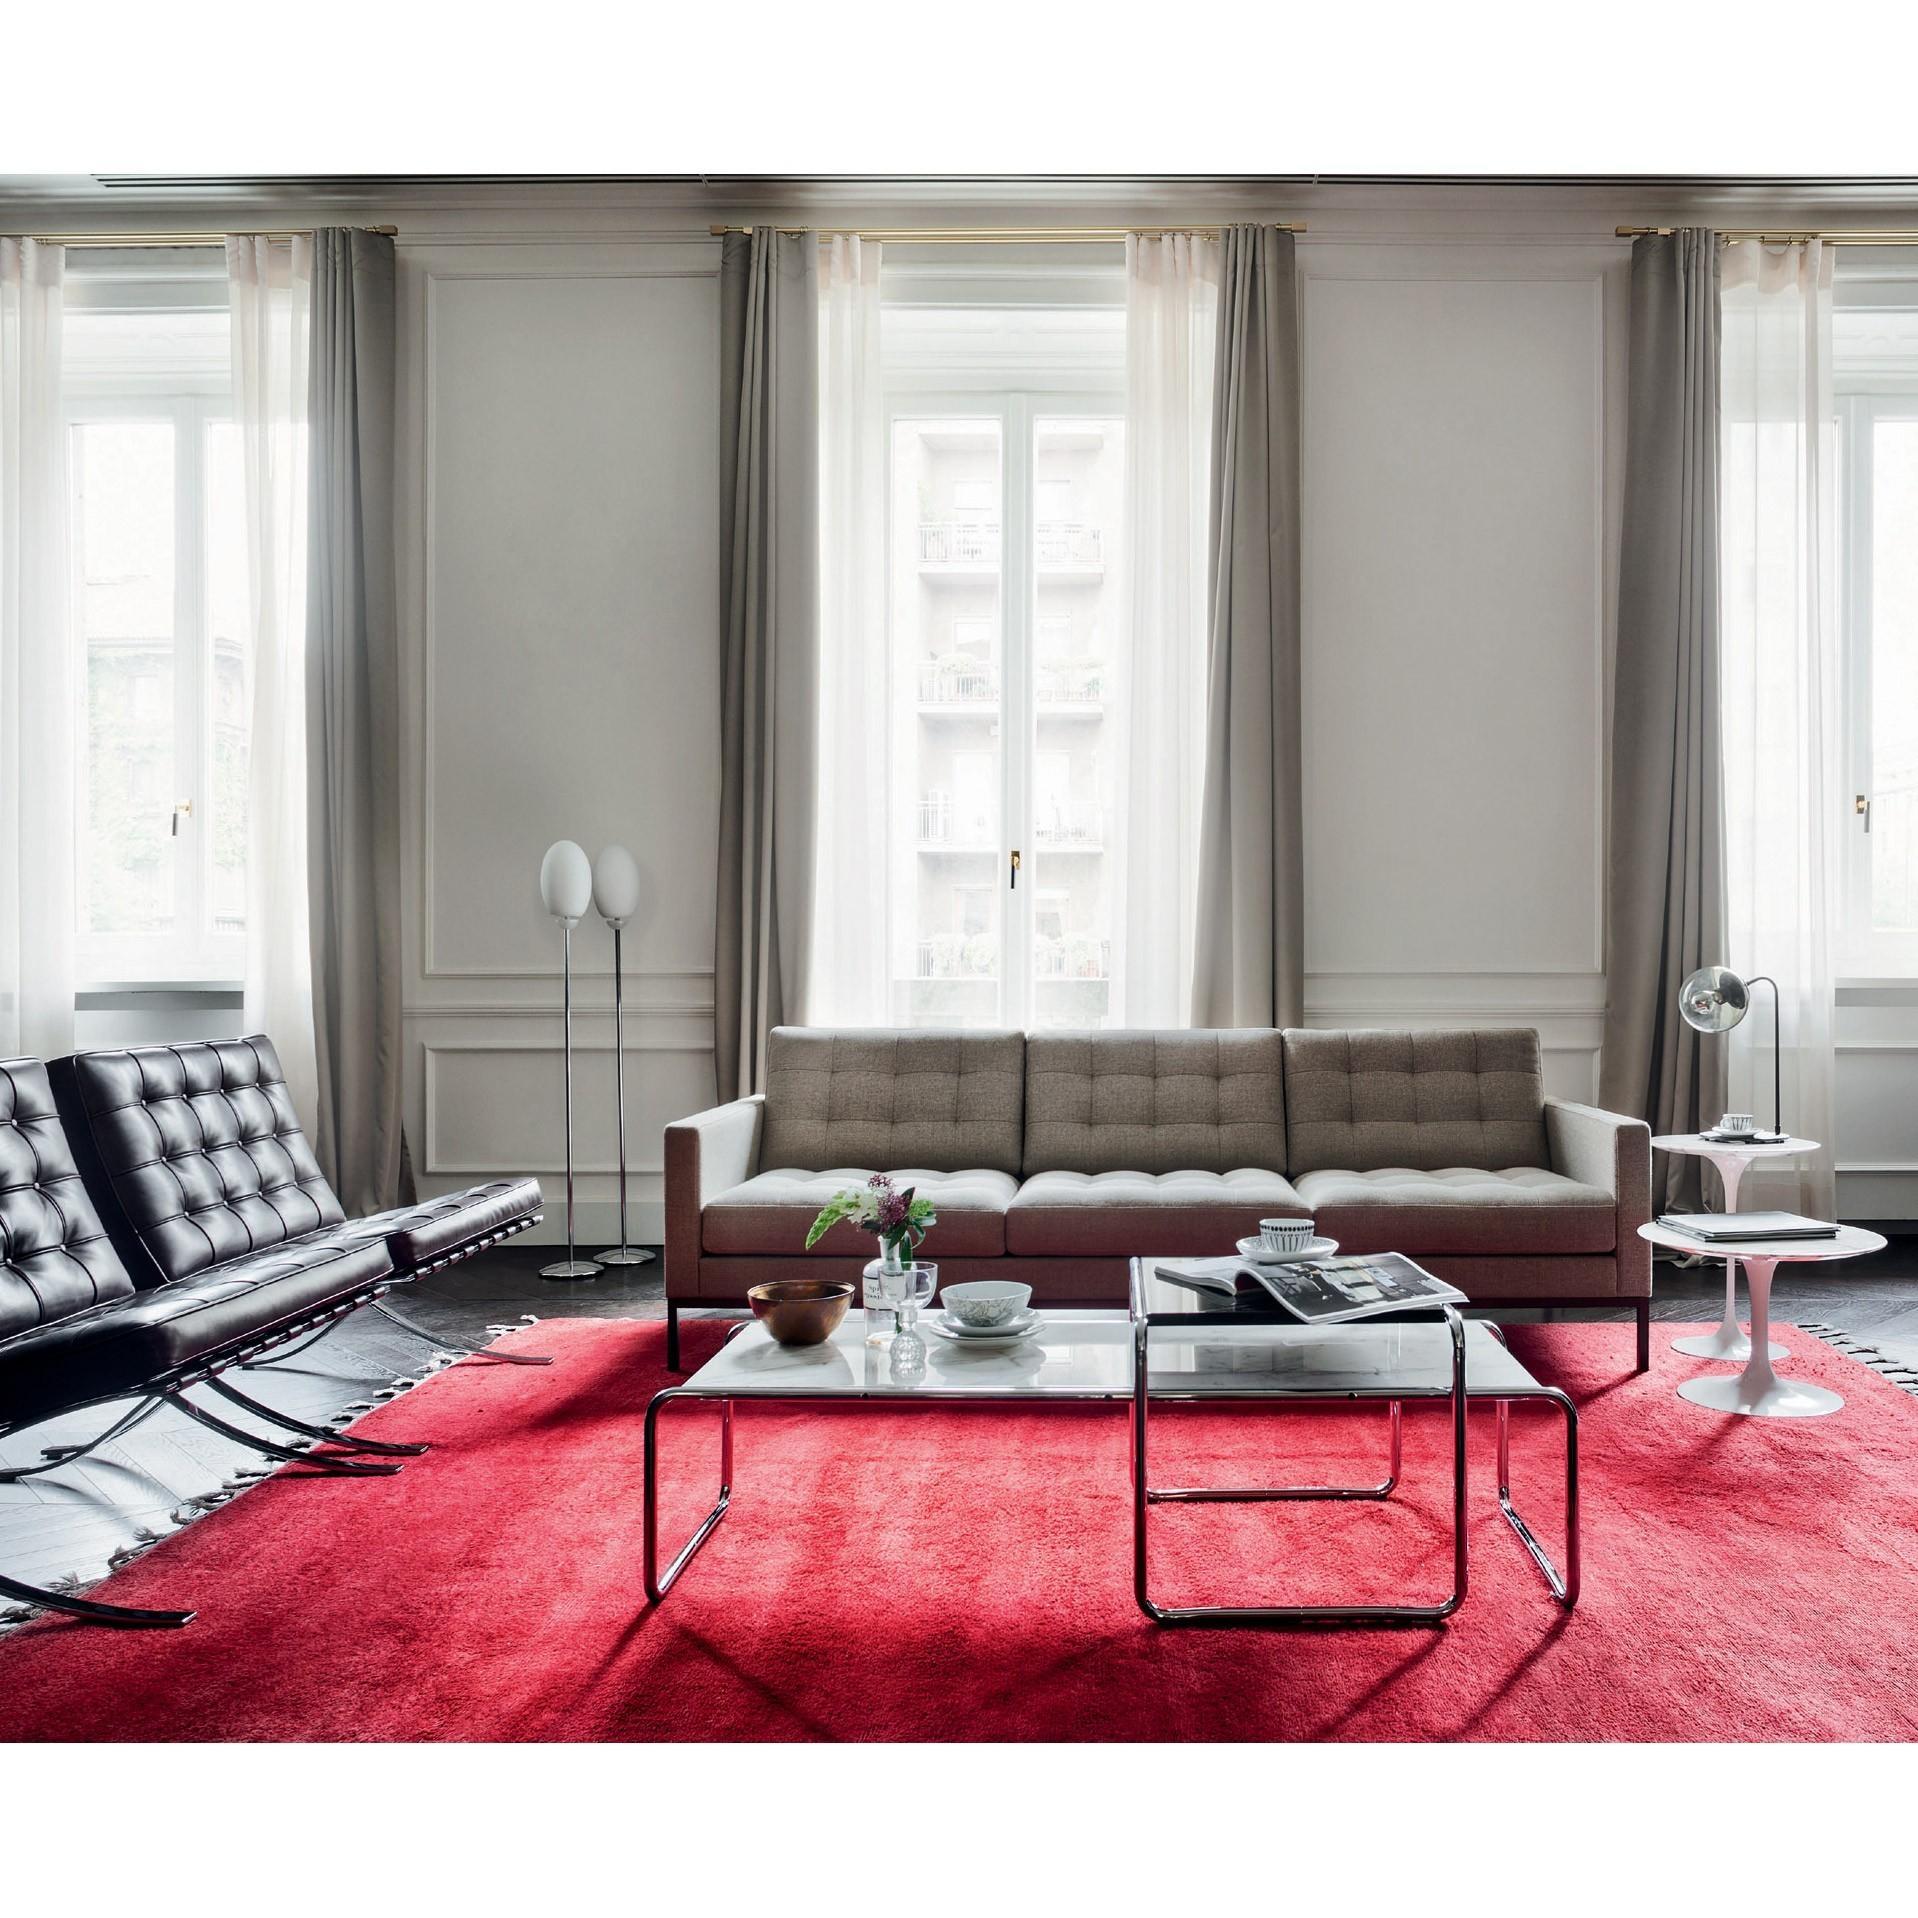 Florence Knoll 'relax' Sofa   Skandium Inside Florence Knoll Sofas (Image 5 of 20)